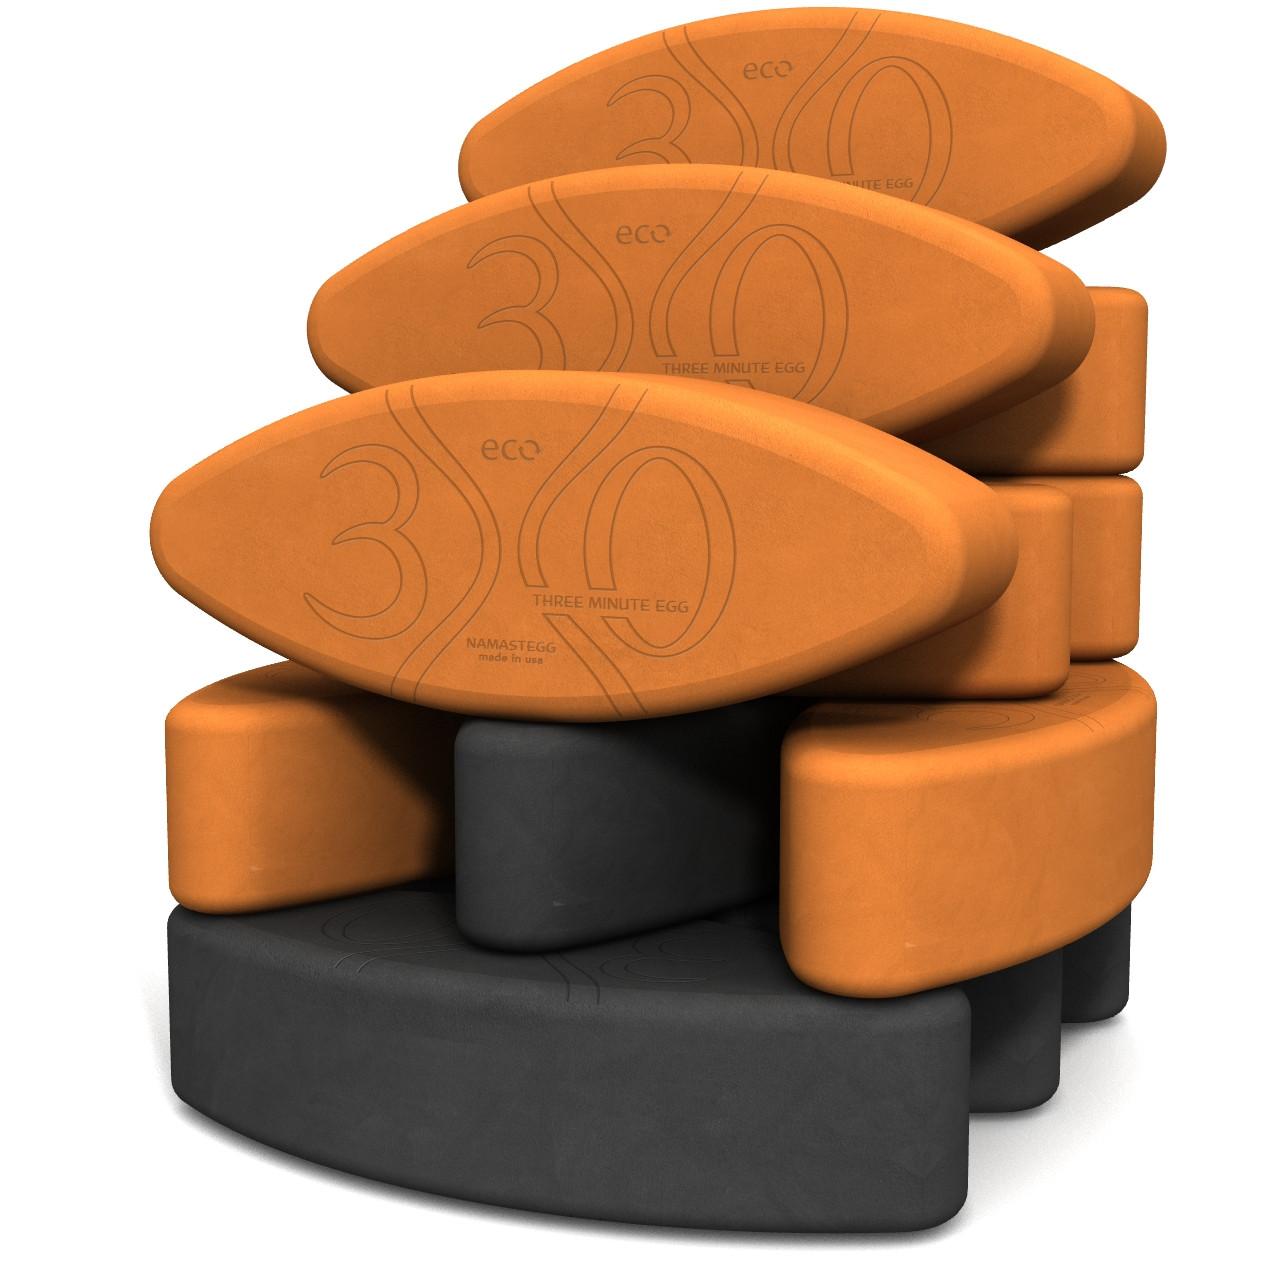 Biodegradable foam yoga block set Teacher s Dozen Yin Yang ECO by Three  Minute Egg in color 648ef1f4956b